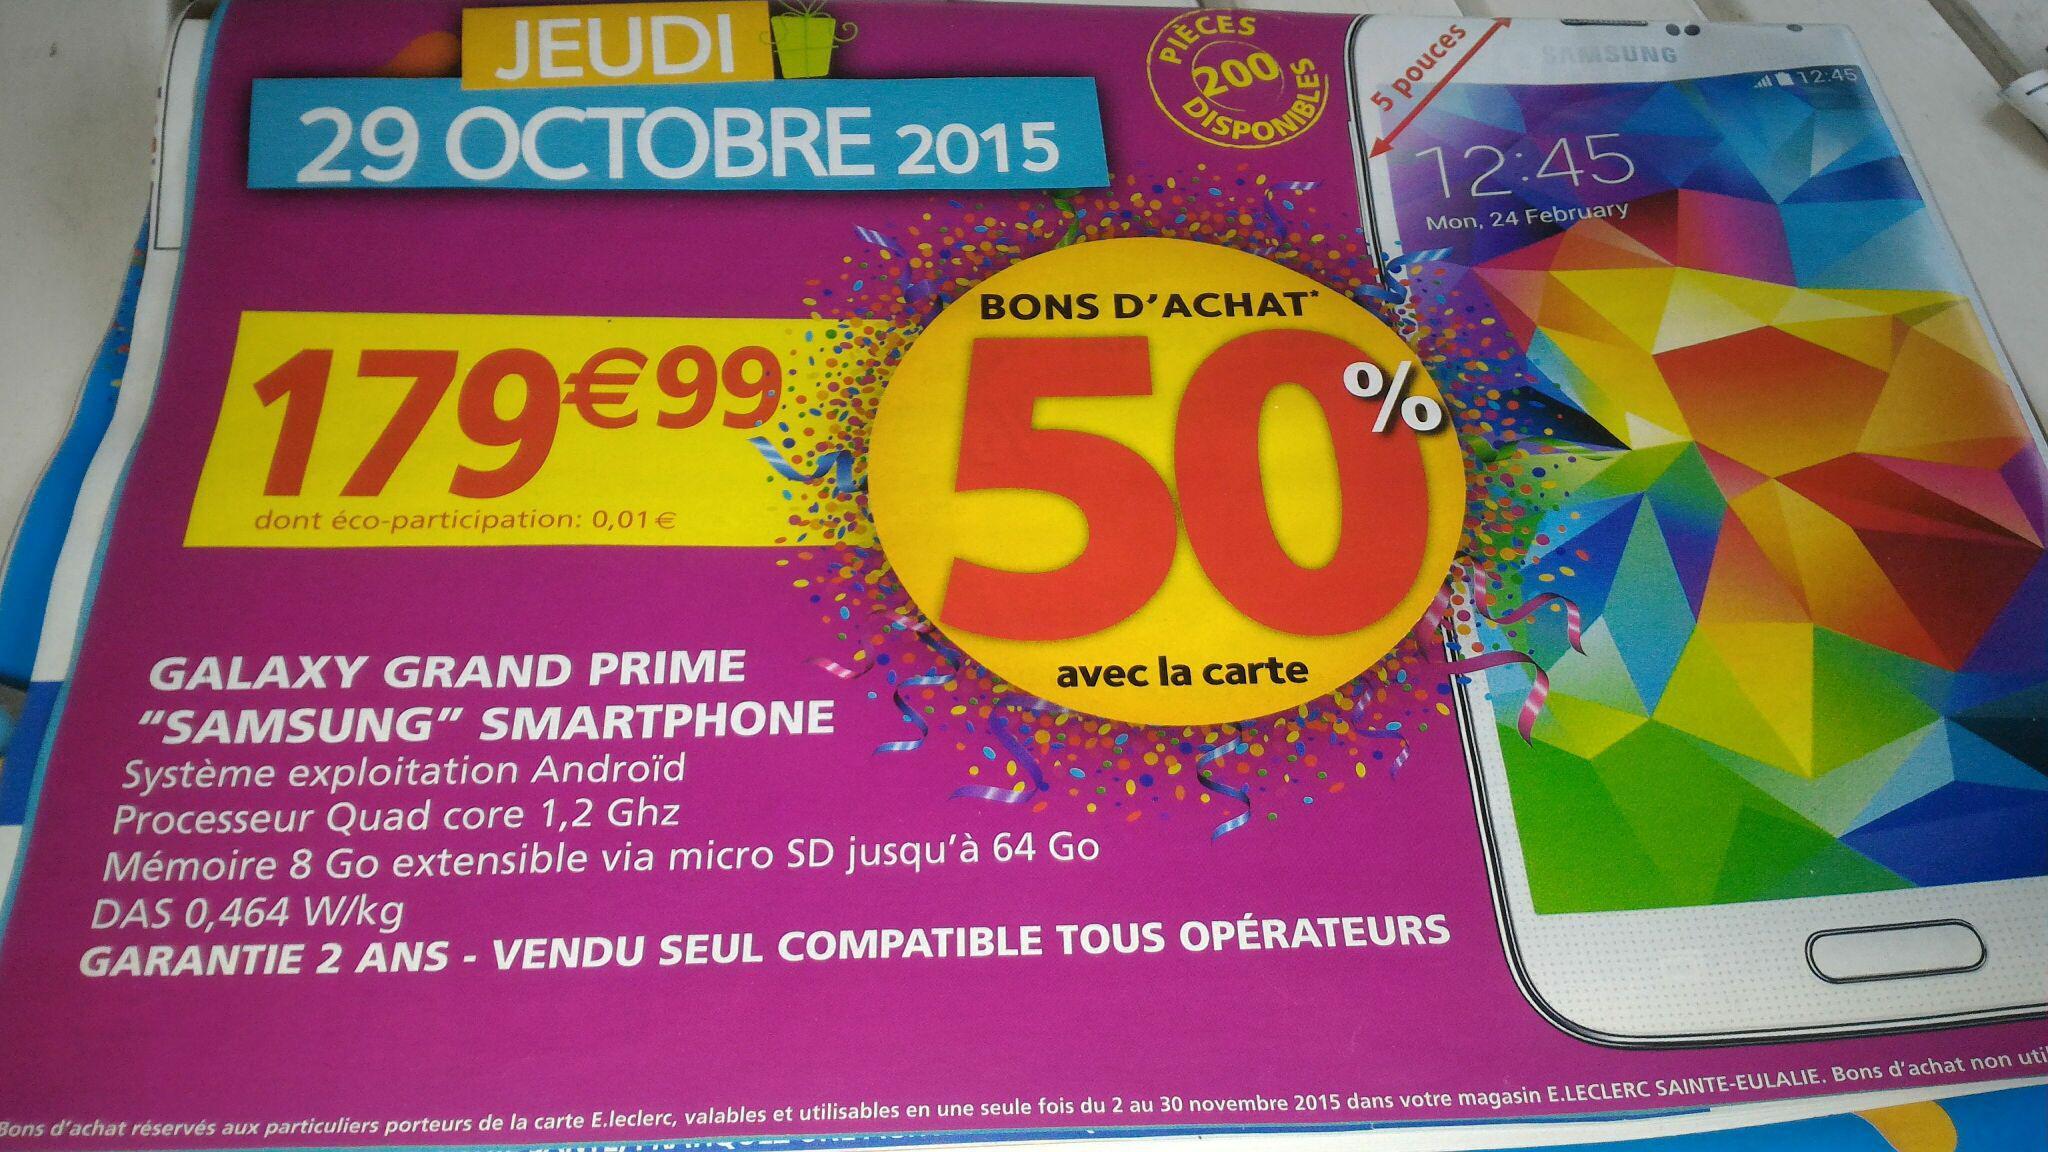 "Smartphone 5"" Samsung Galaxy Grand Prime (50% en bons d'achat avec la carte)"